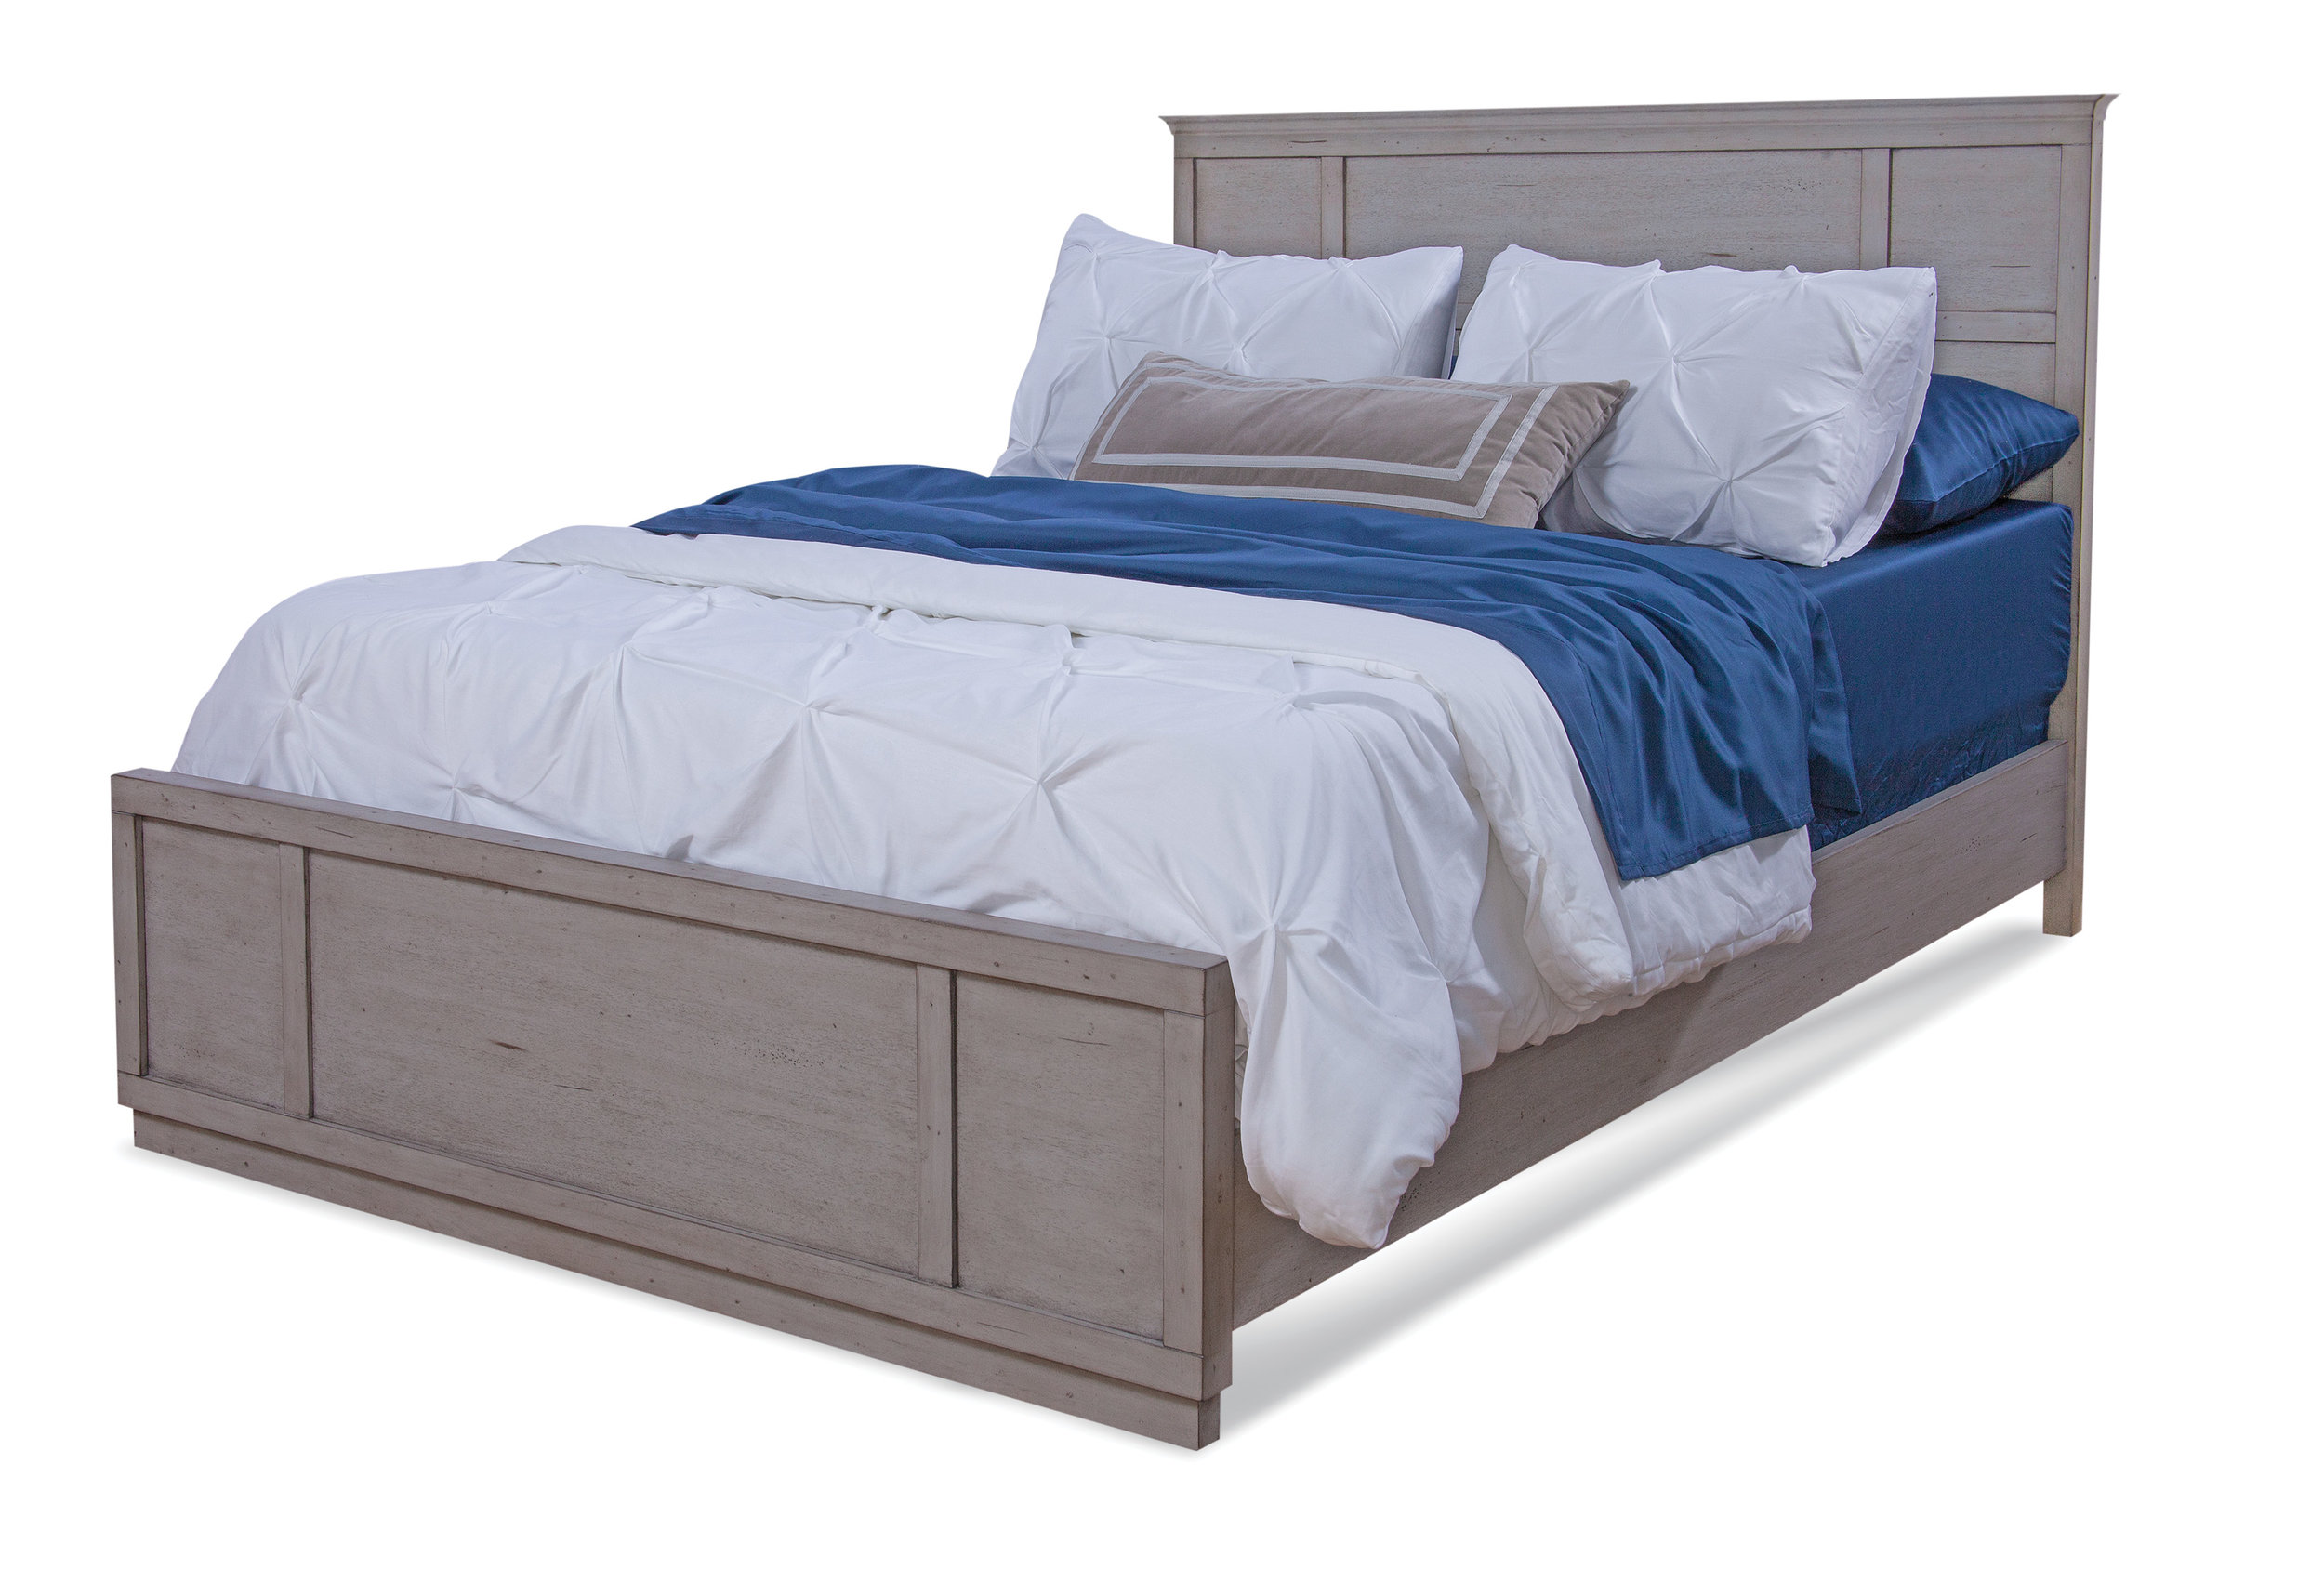 Queen Bed Only